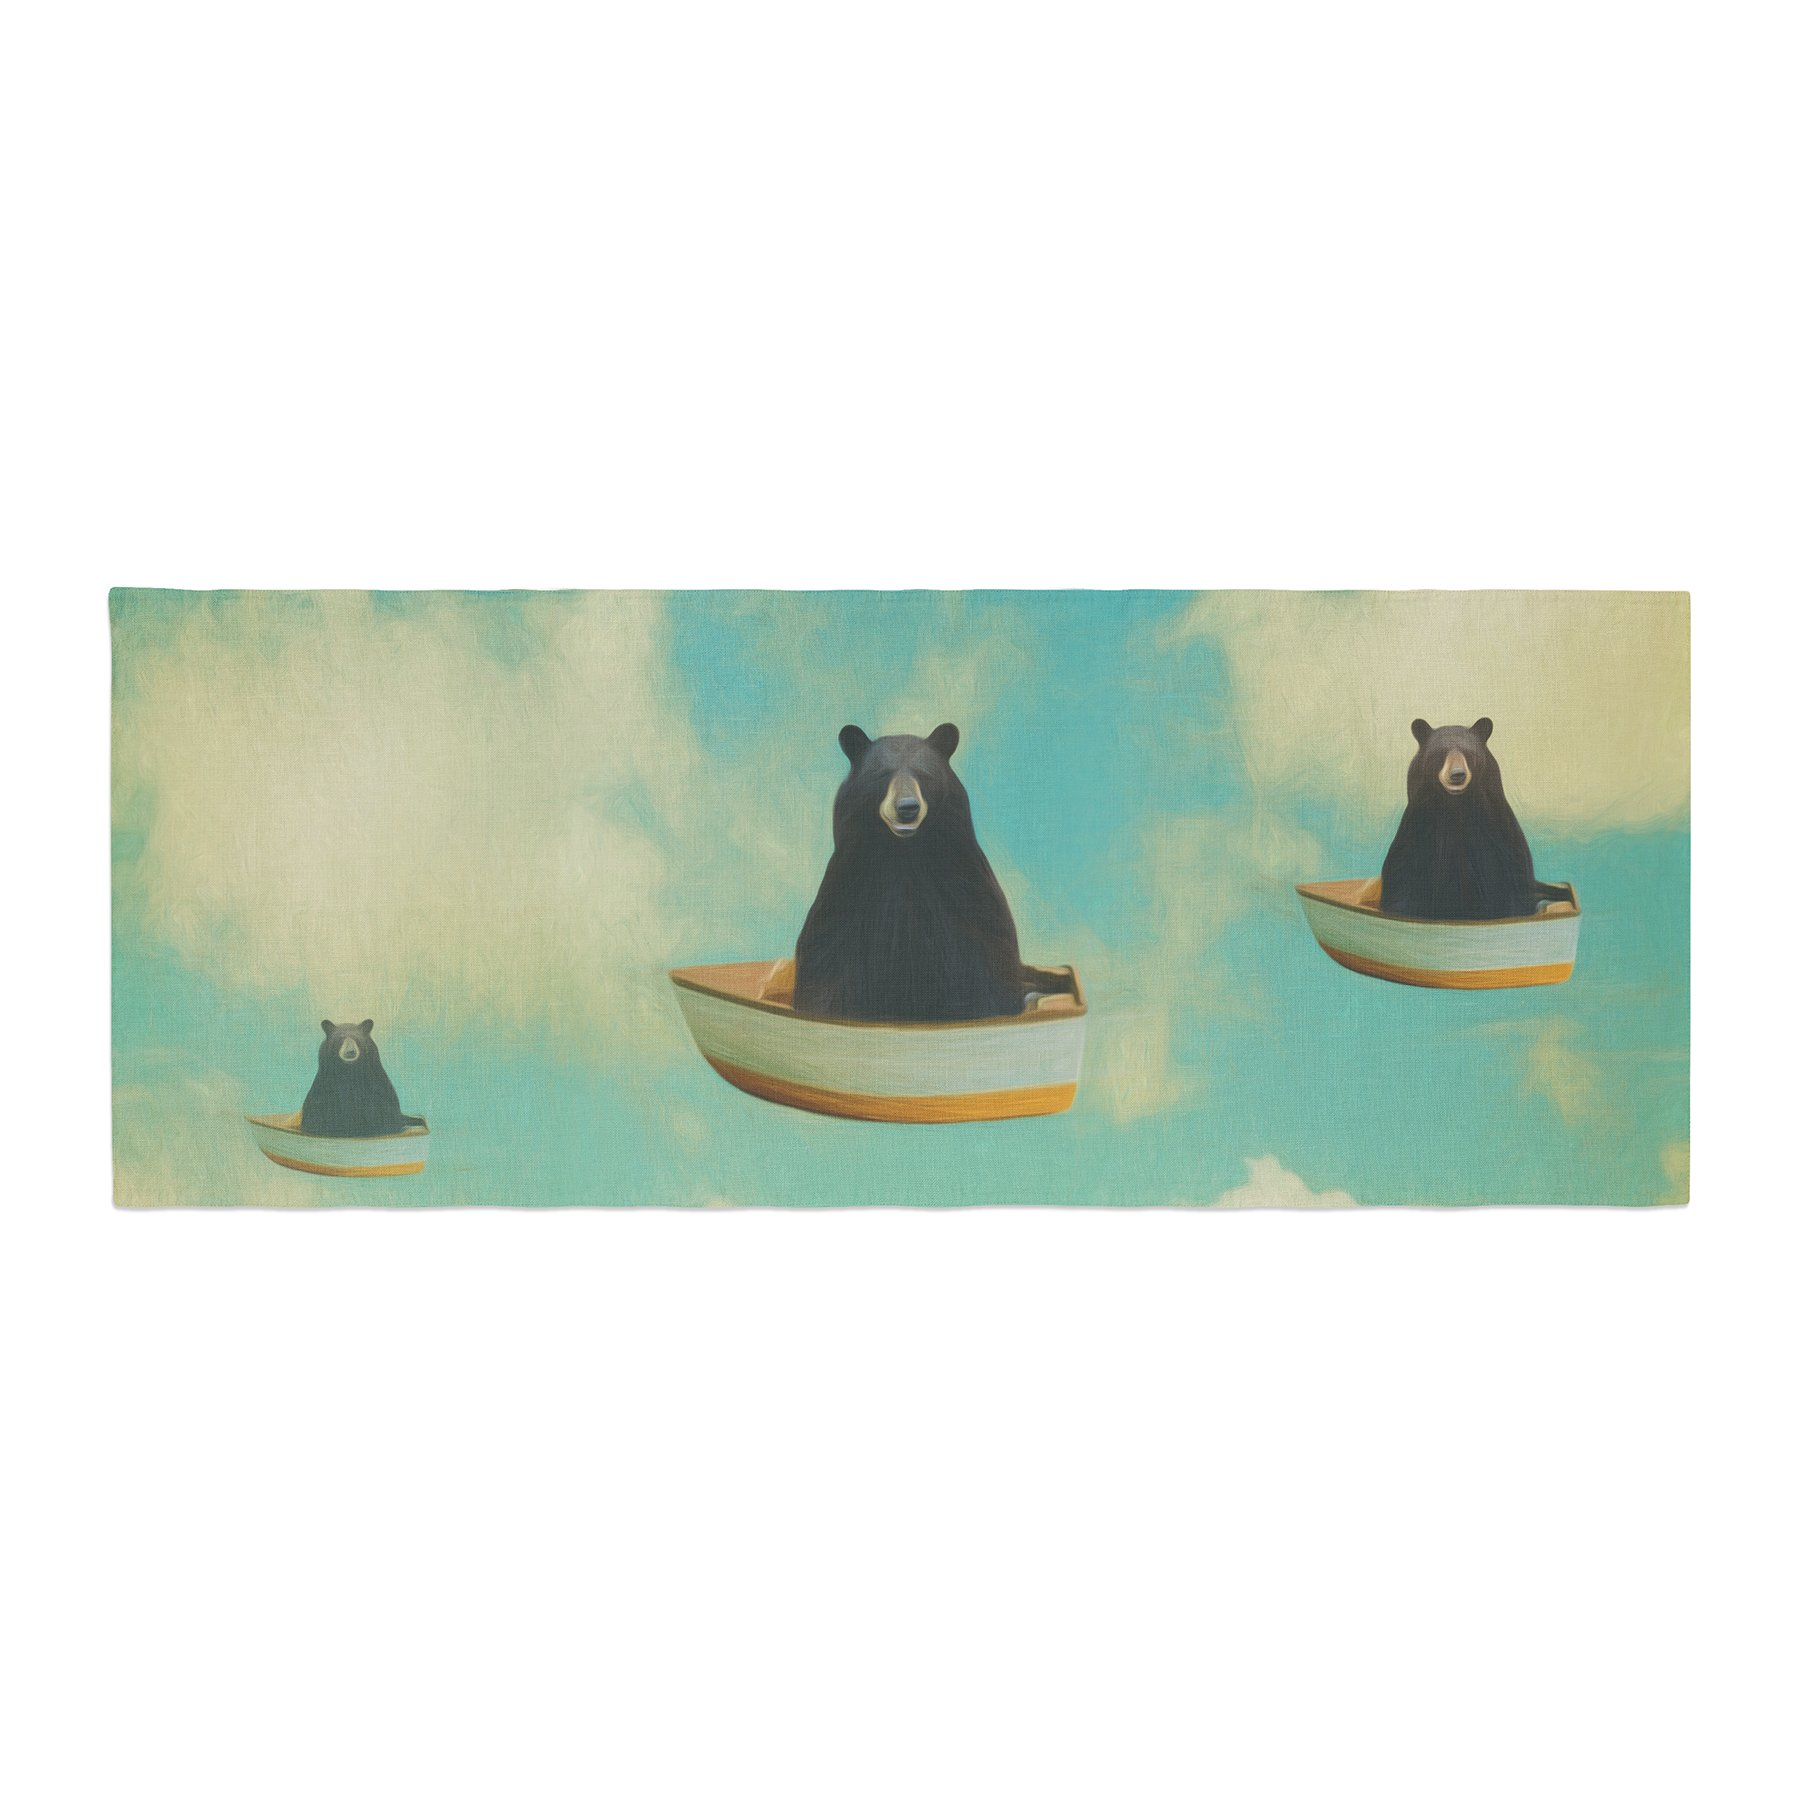 Kess InHouse Natt Bears Floating Animals Bed Runner, 34'' x 86''